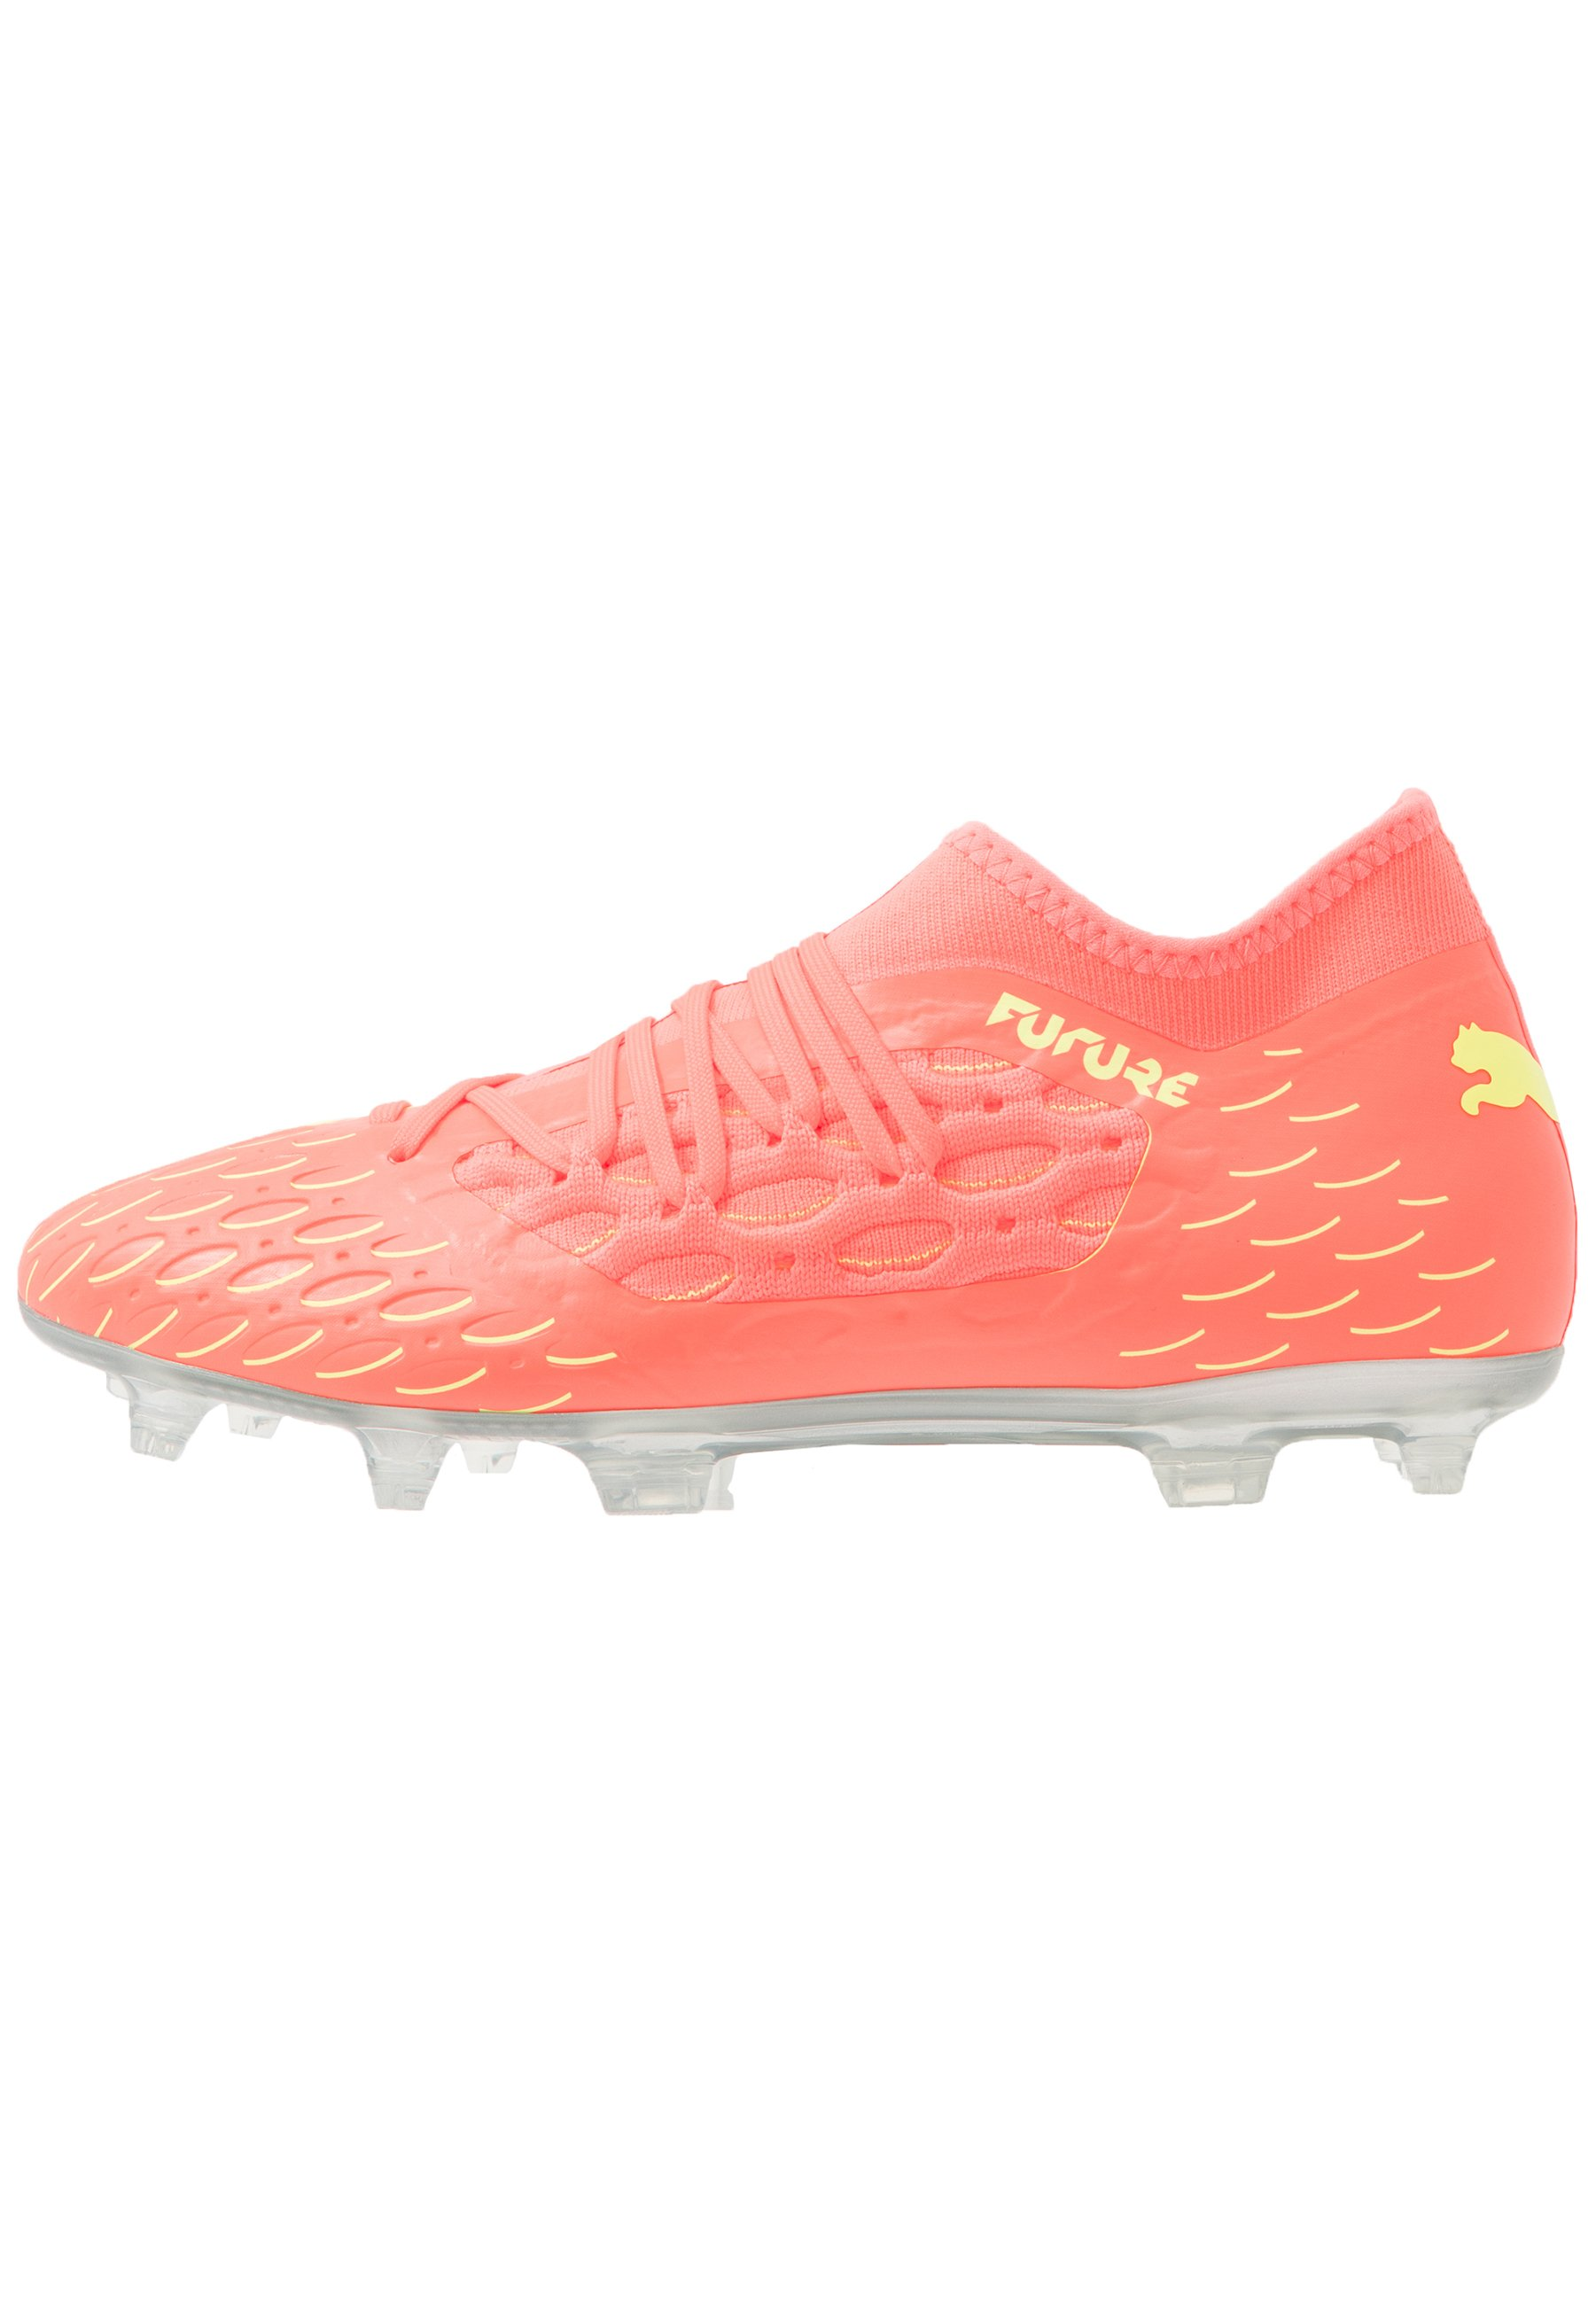 FUTURE 5.3 NETFIT OSG FGAG Chaussures de foot à crampons energy peachfizzy yellow